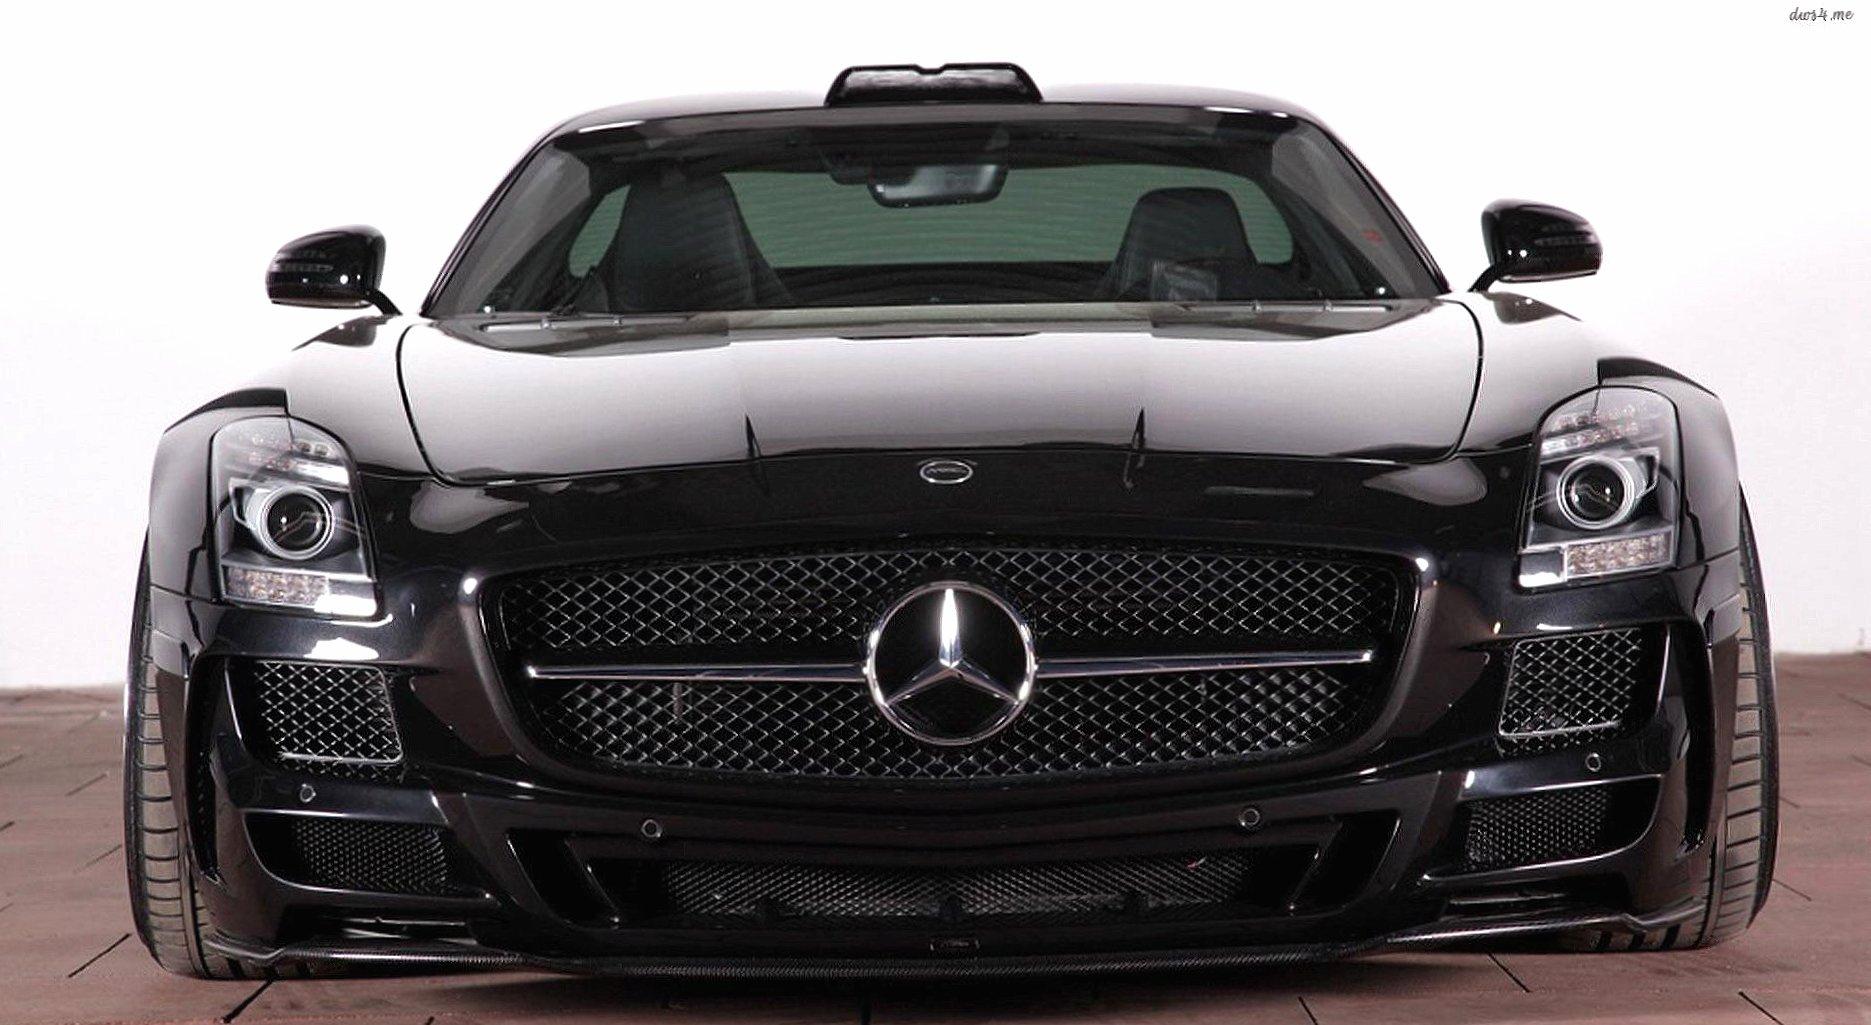 Mercedes benz sls amg wallpapers HD quality